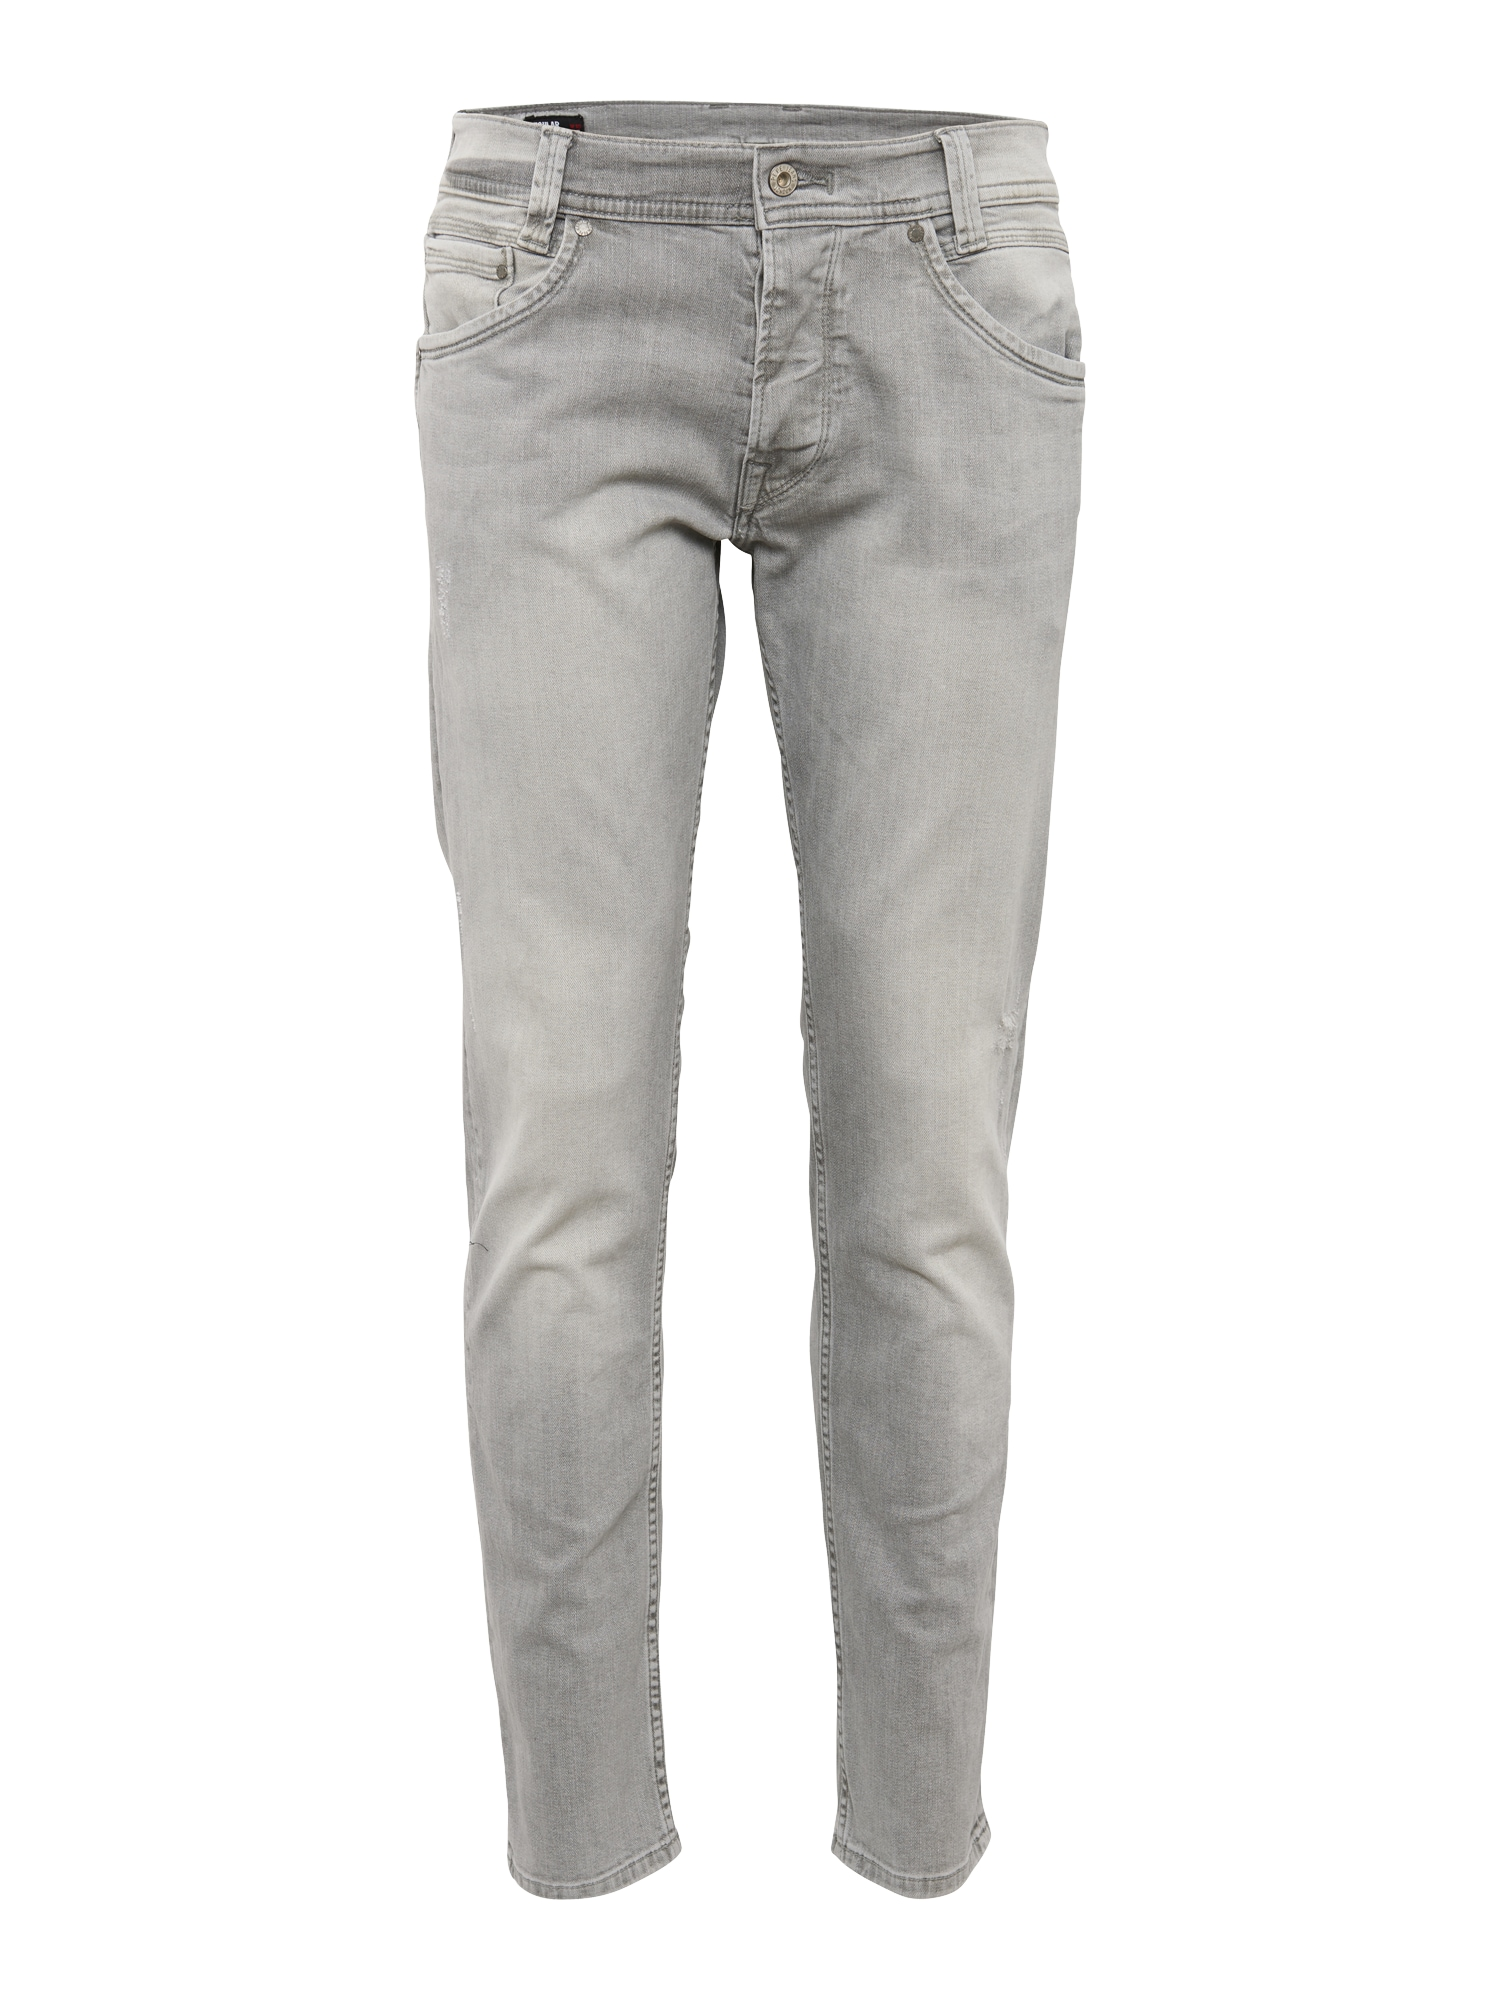 Pepe Jeans Heren Jeans Spike grey denim